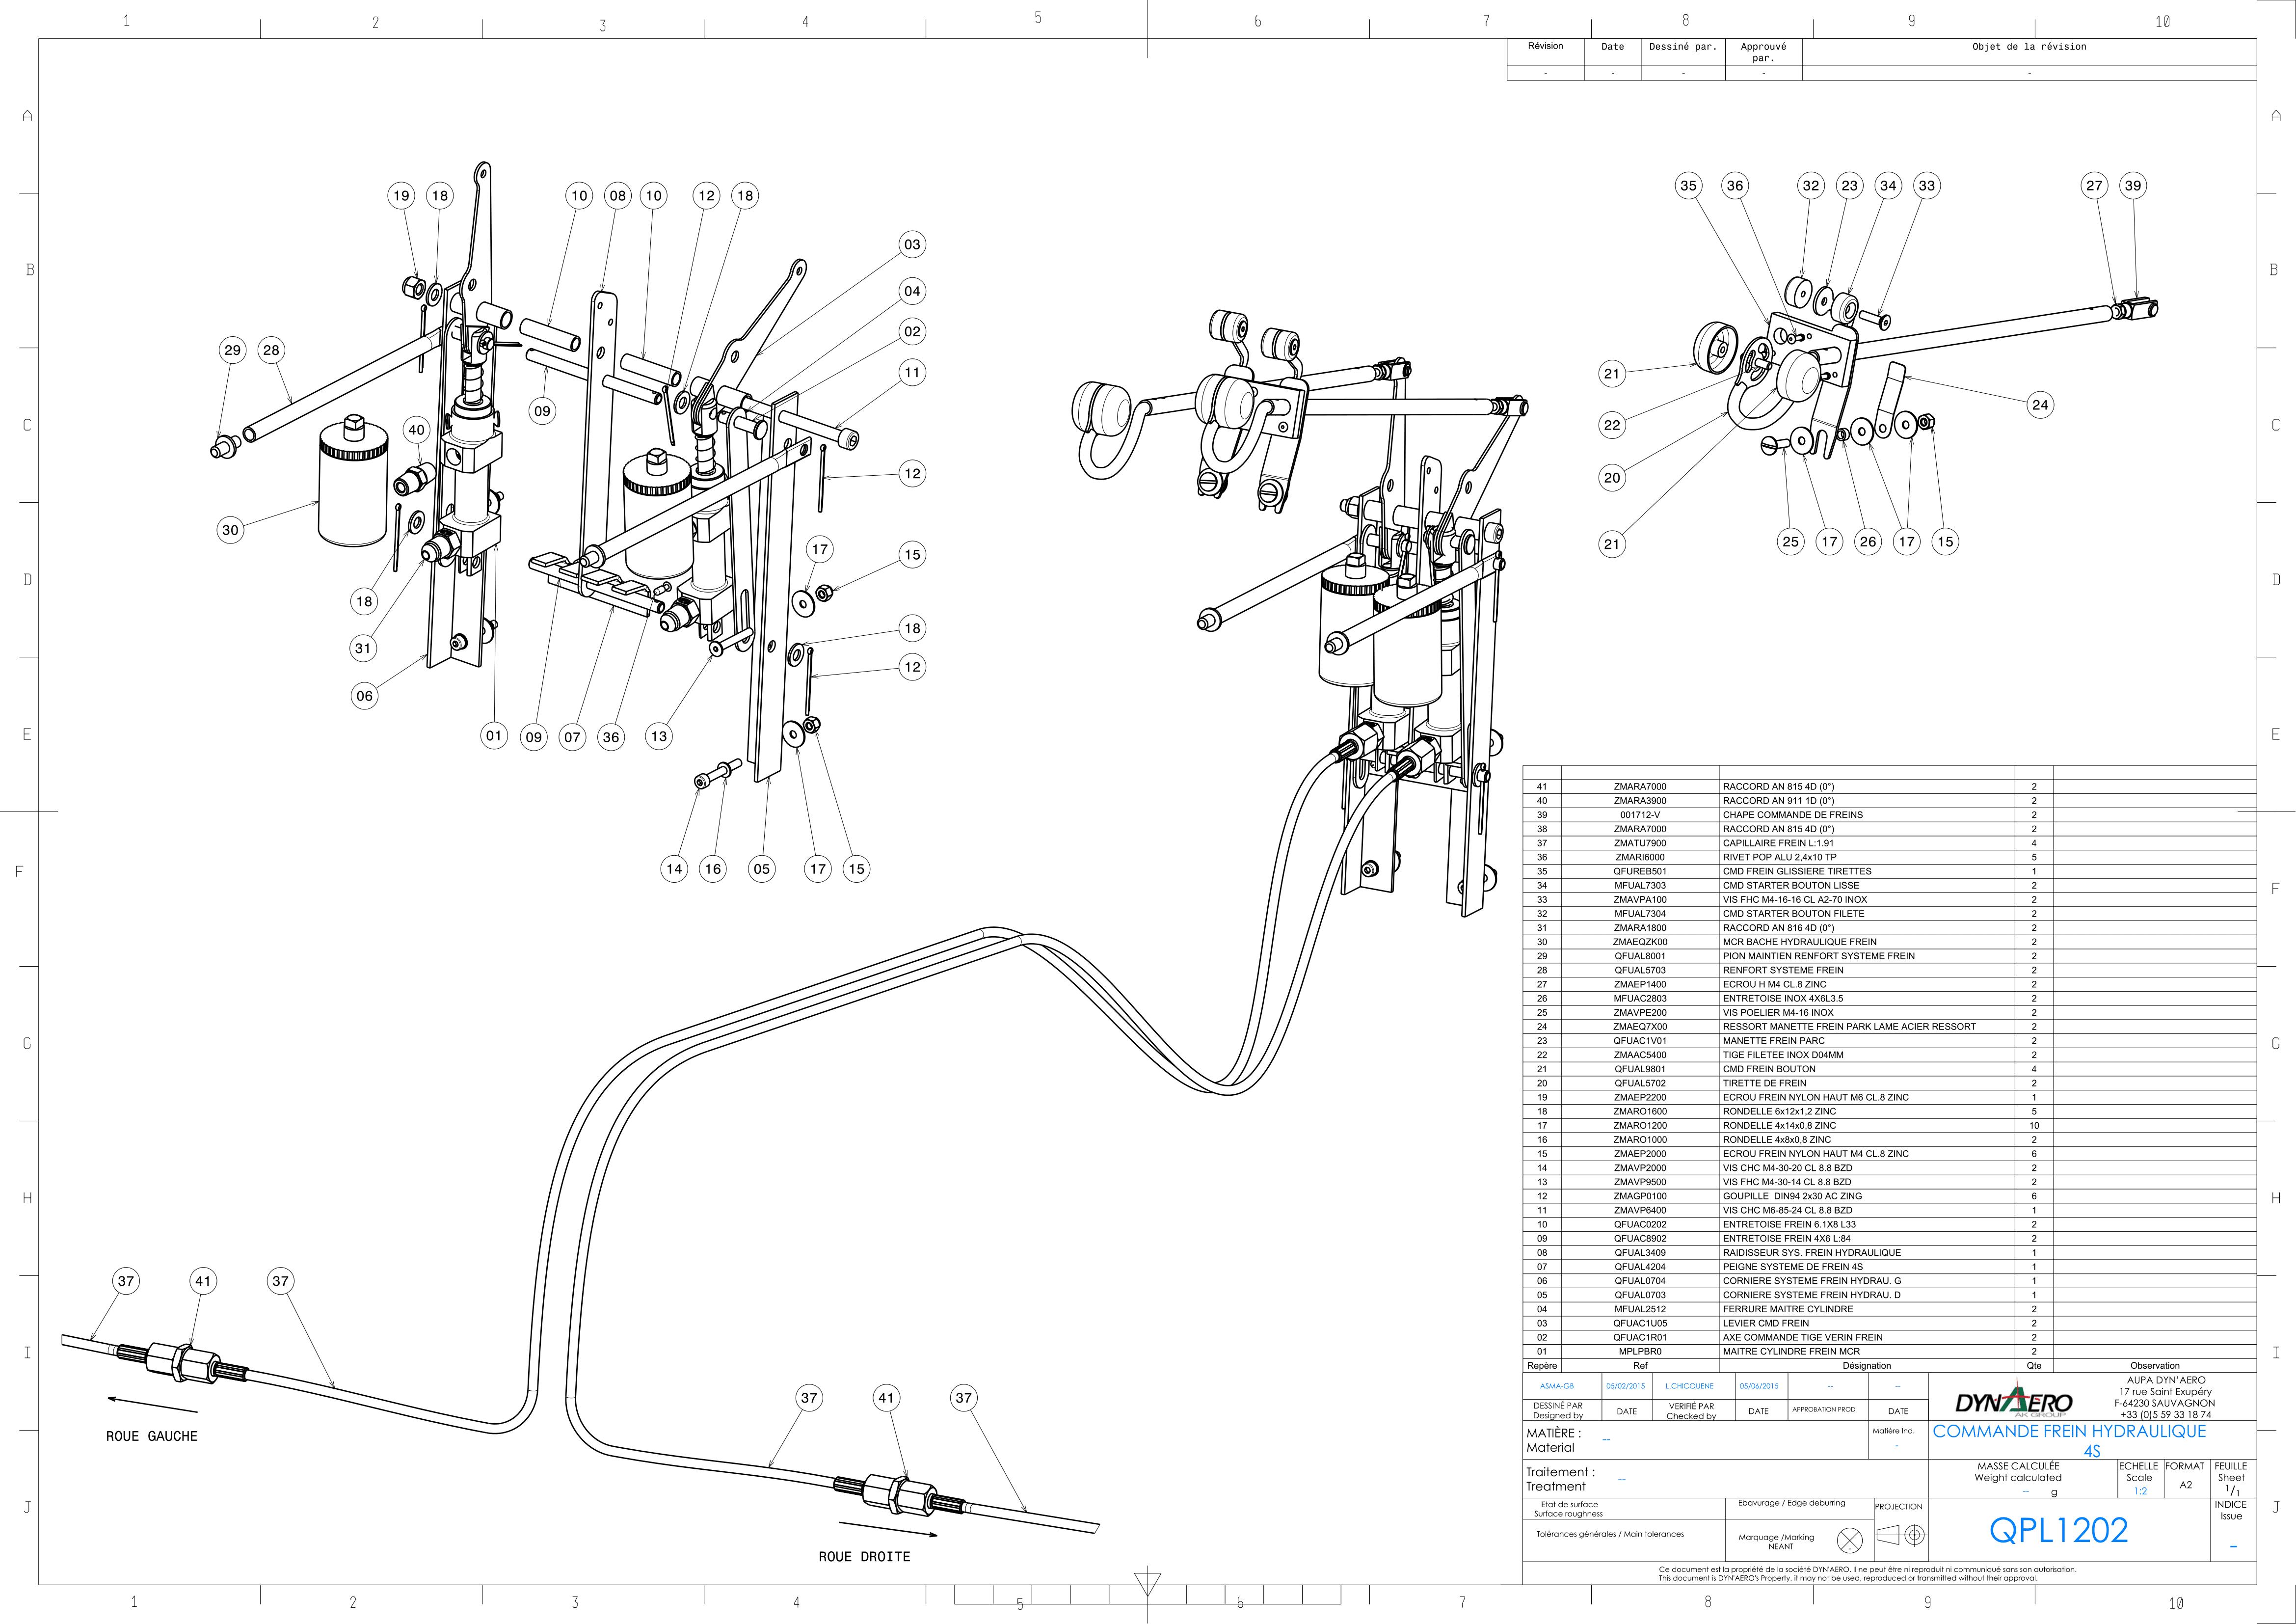 QPL1202 - COMMANDE FREINS HYDRAULIQUES 4S